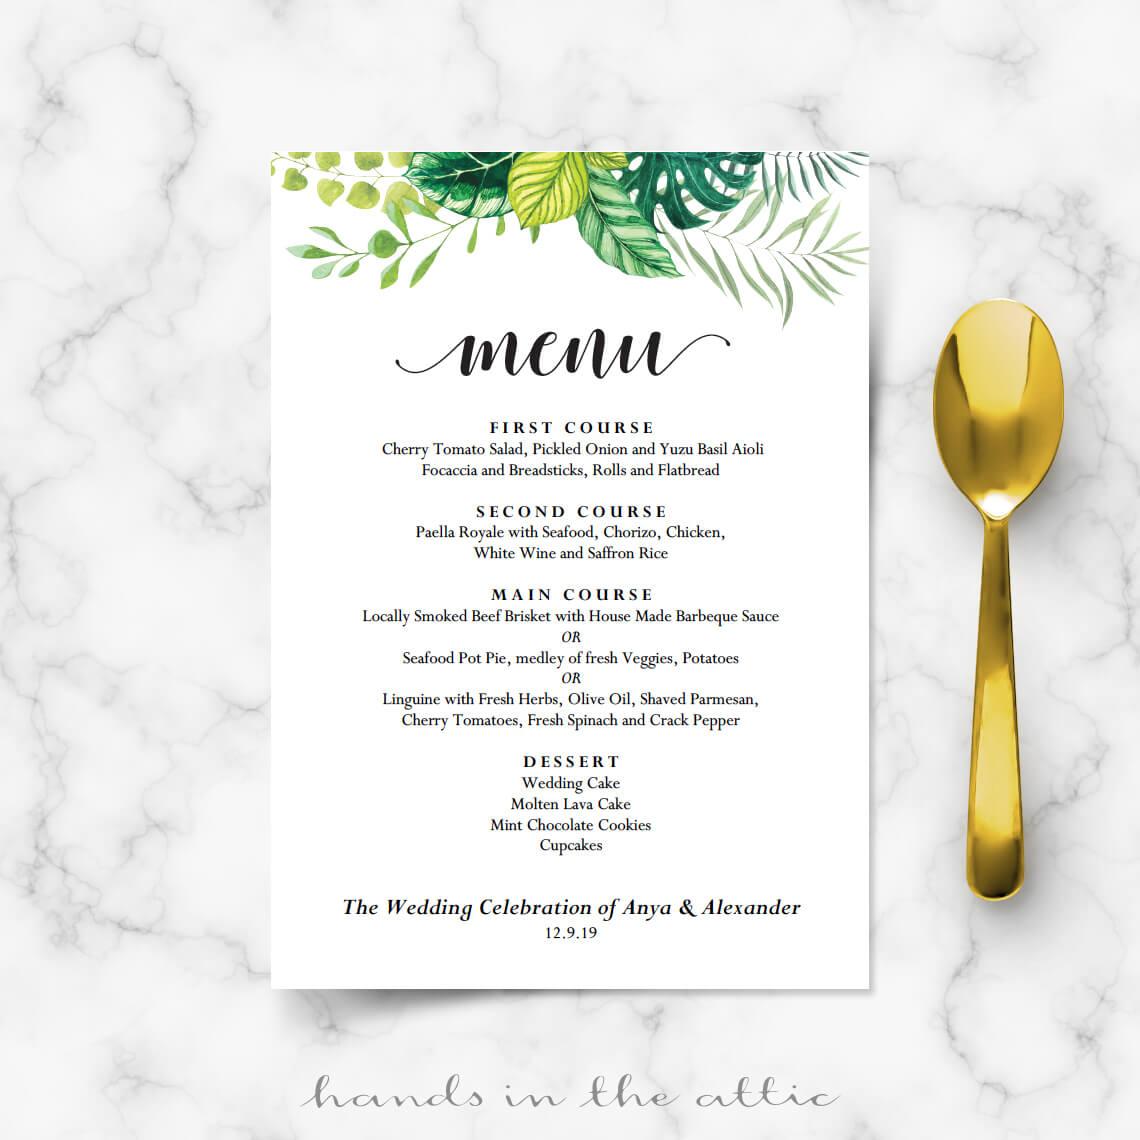 Garden Wedding Menu Printable Templates Hands In The Attic